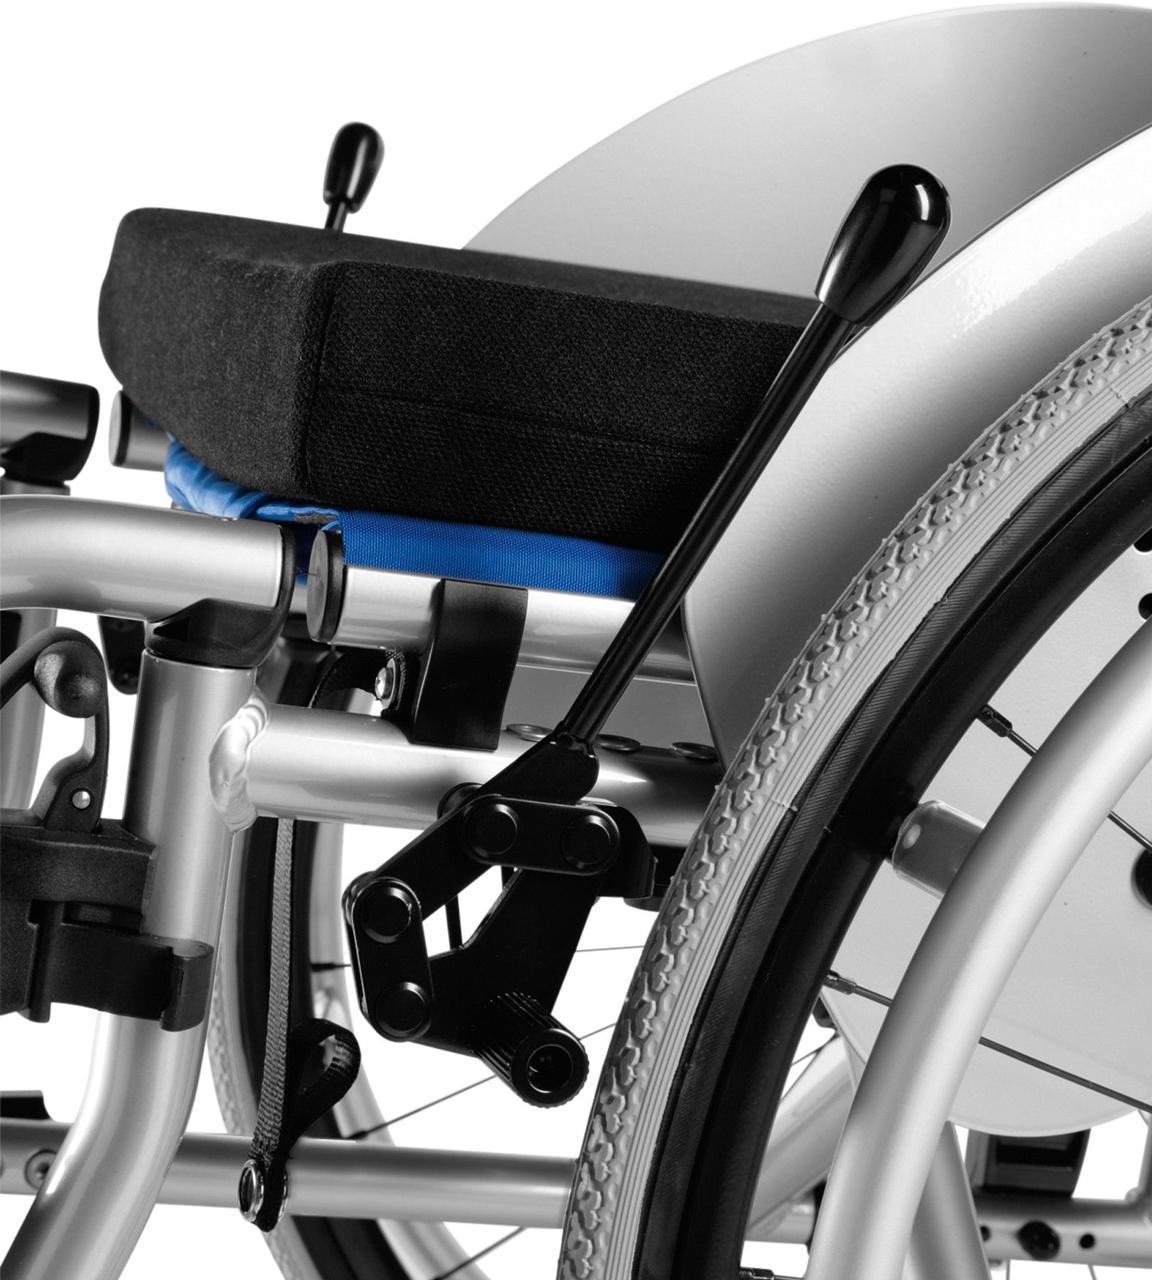 Кресло-коляска Otto Bock АВАНГАРД ТИН активного типа для детей и подростков - фото 2